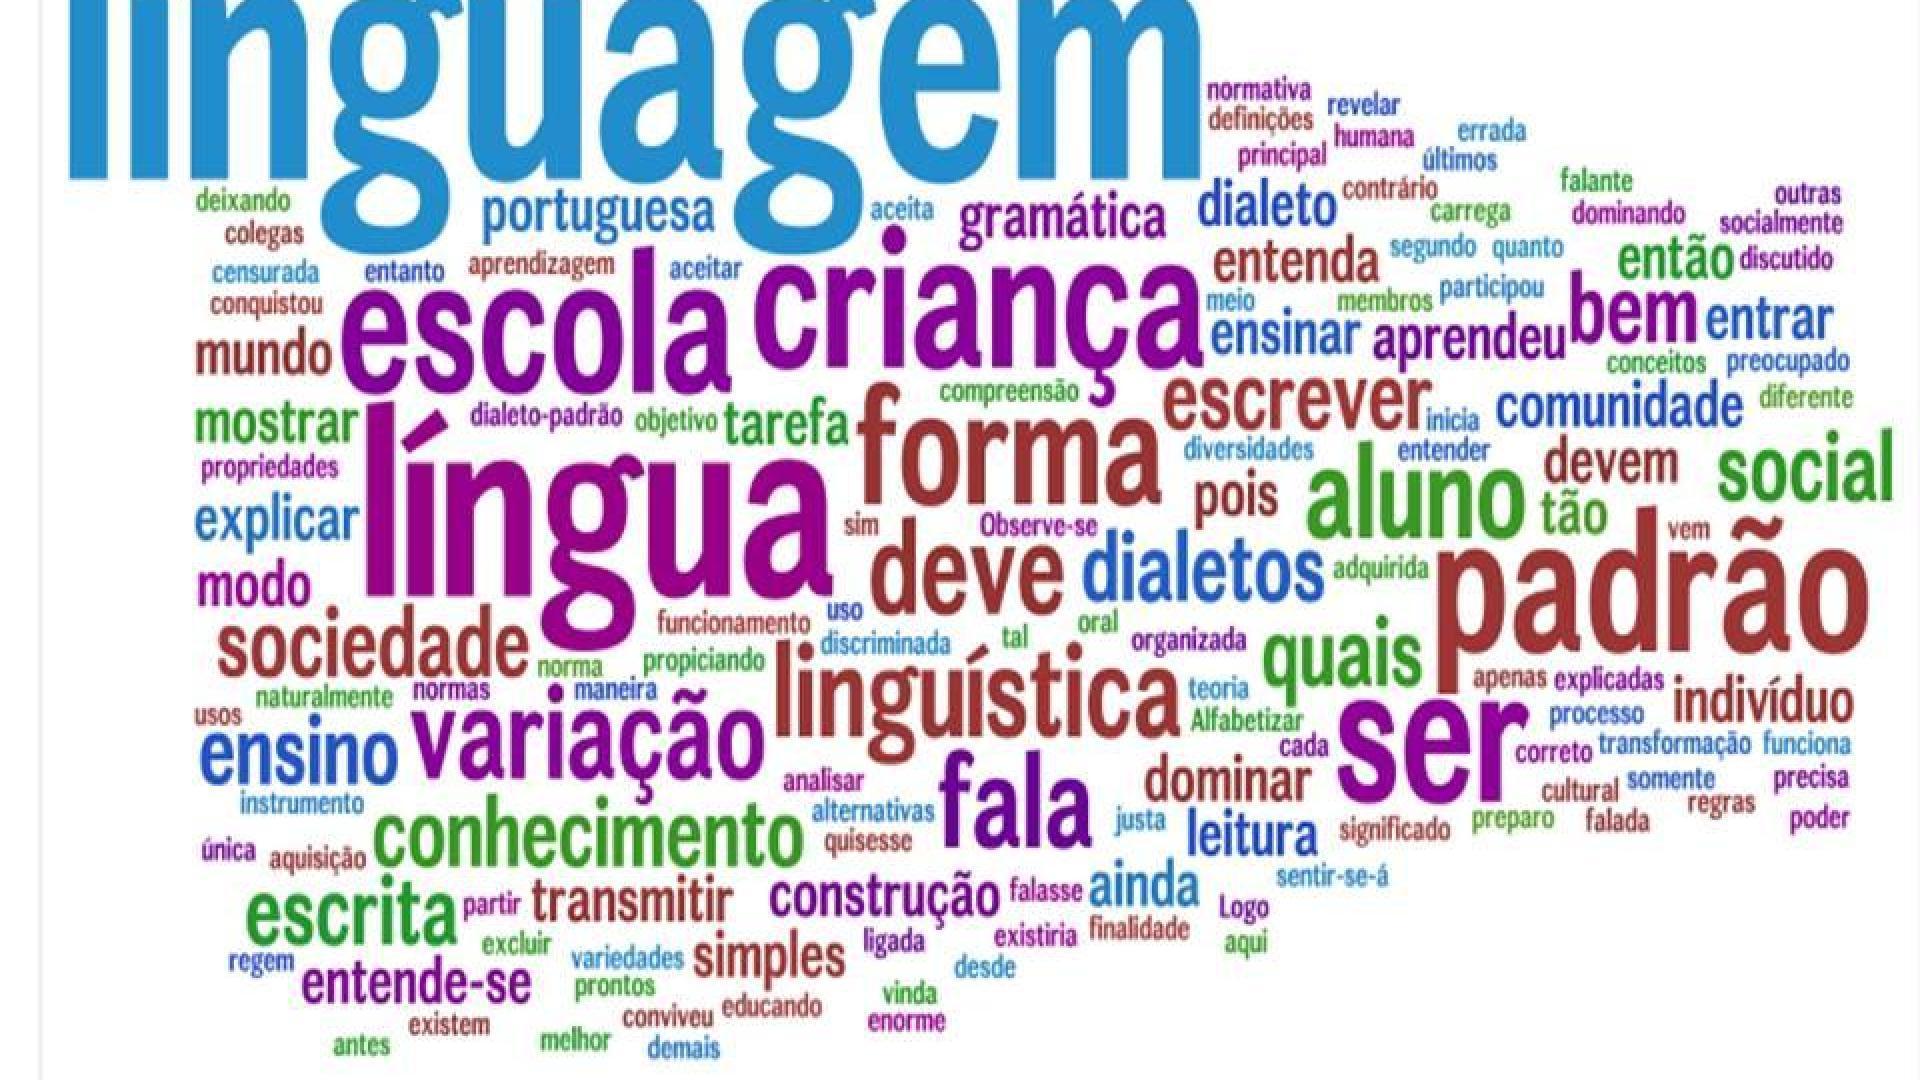 Nova Gramática Brasileira